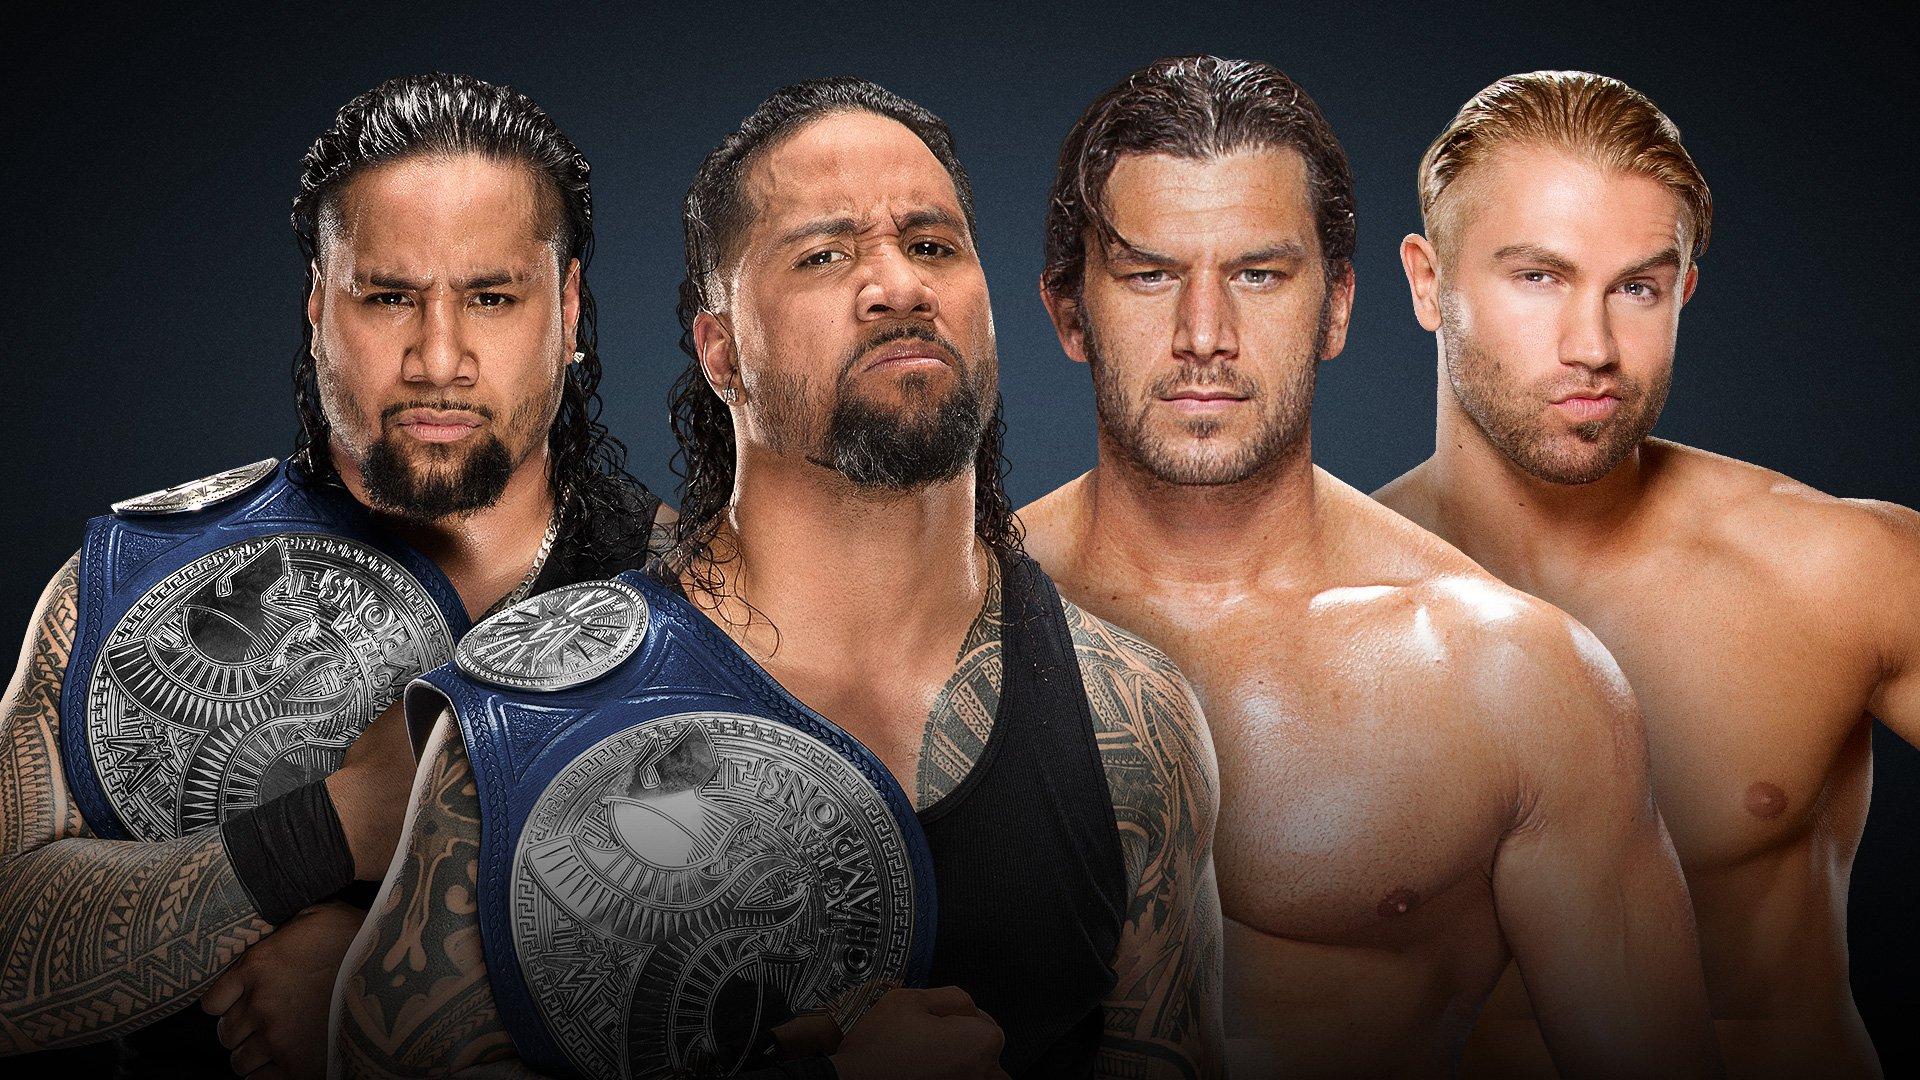 WWE Backlash 2017: The Usos vs. Breezango